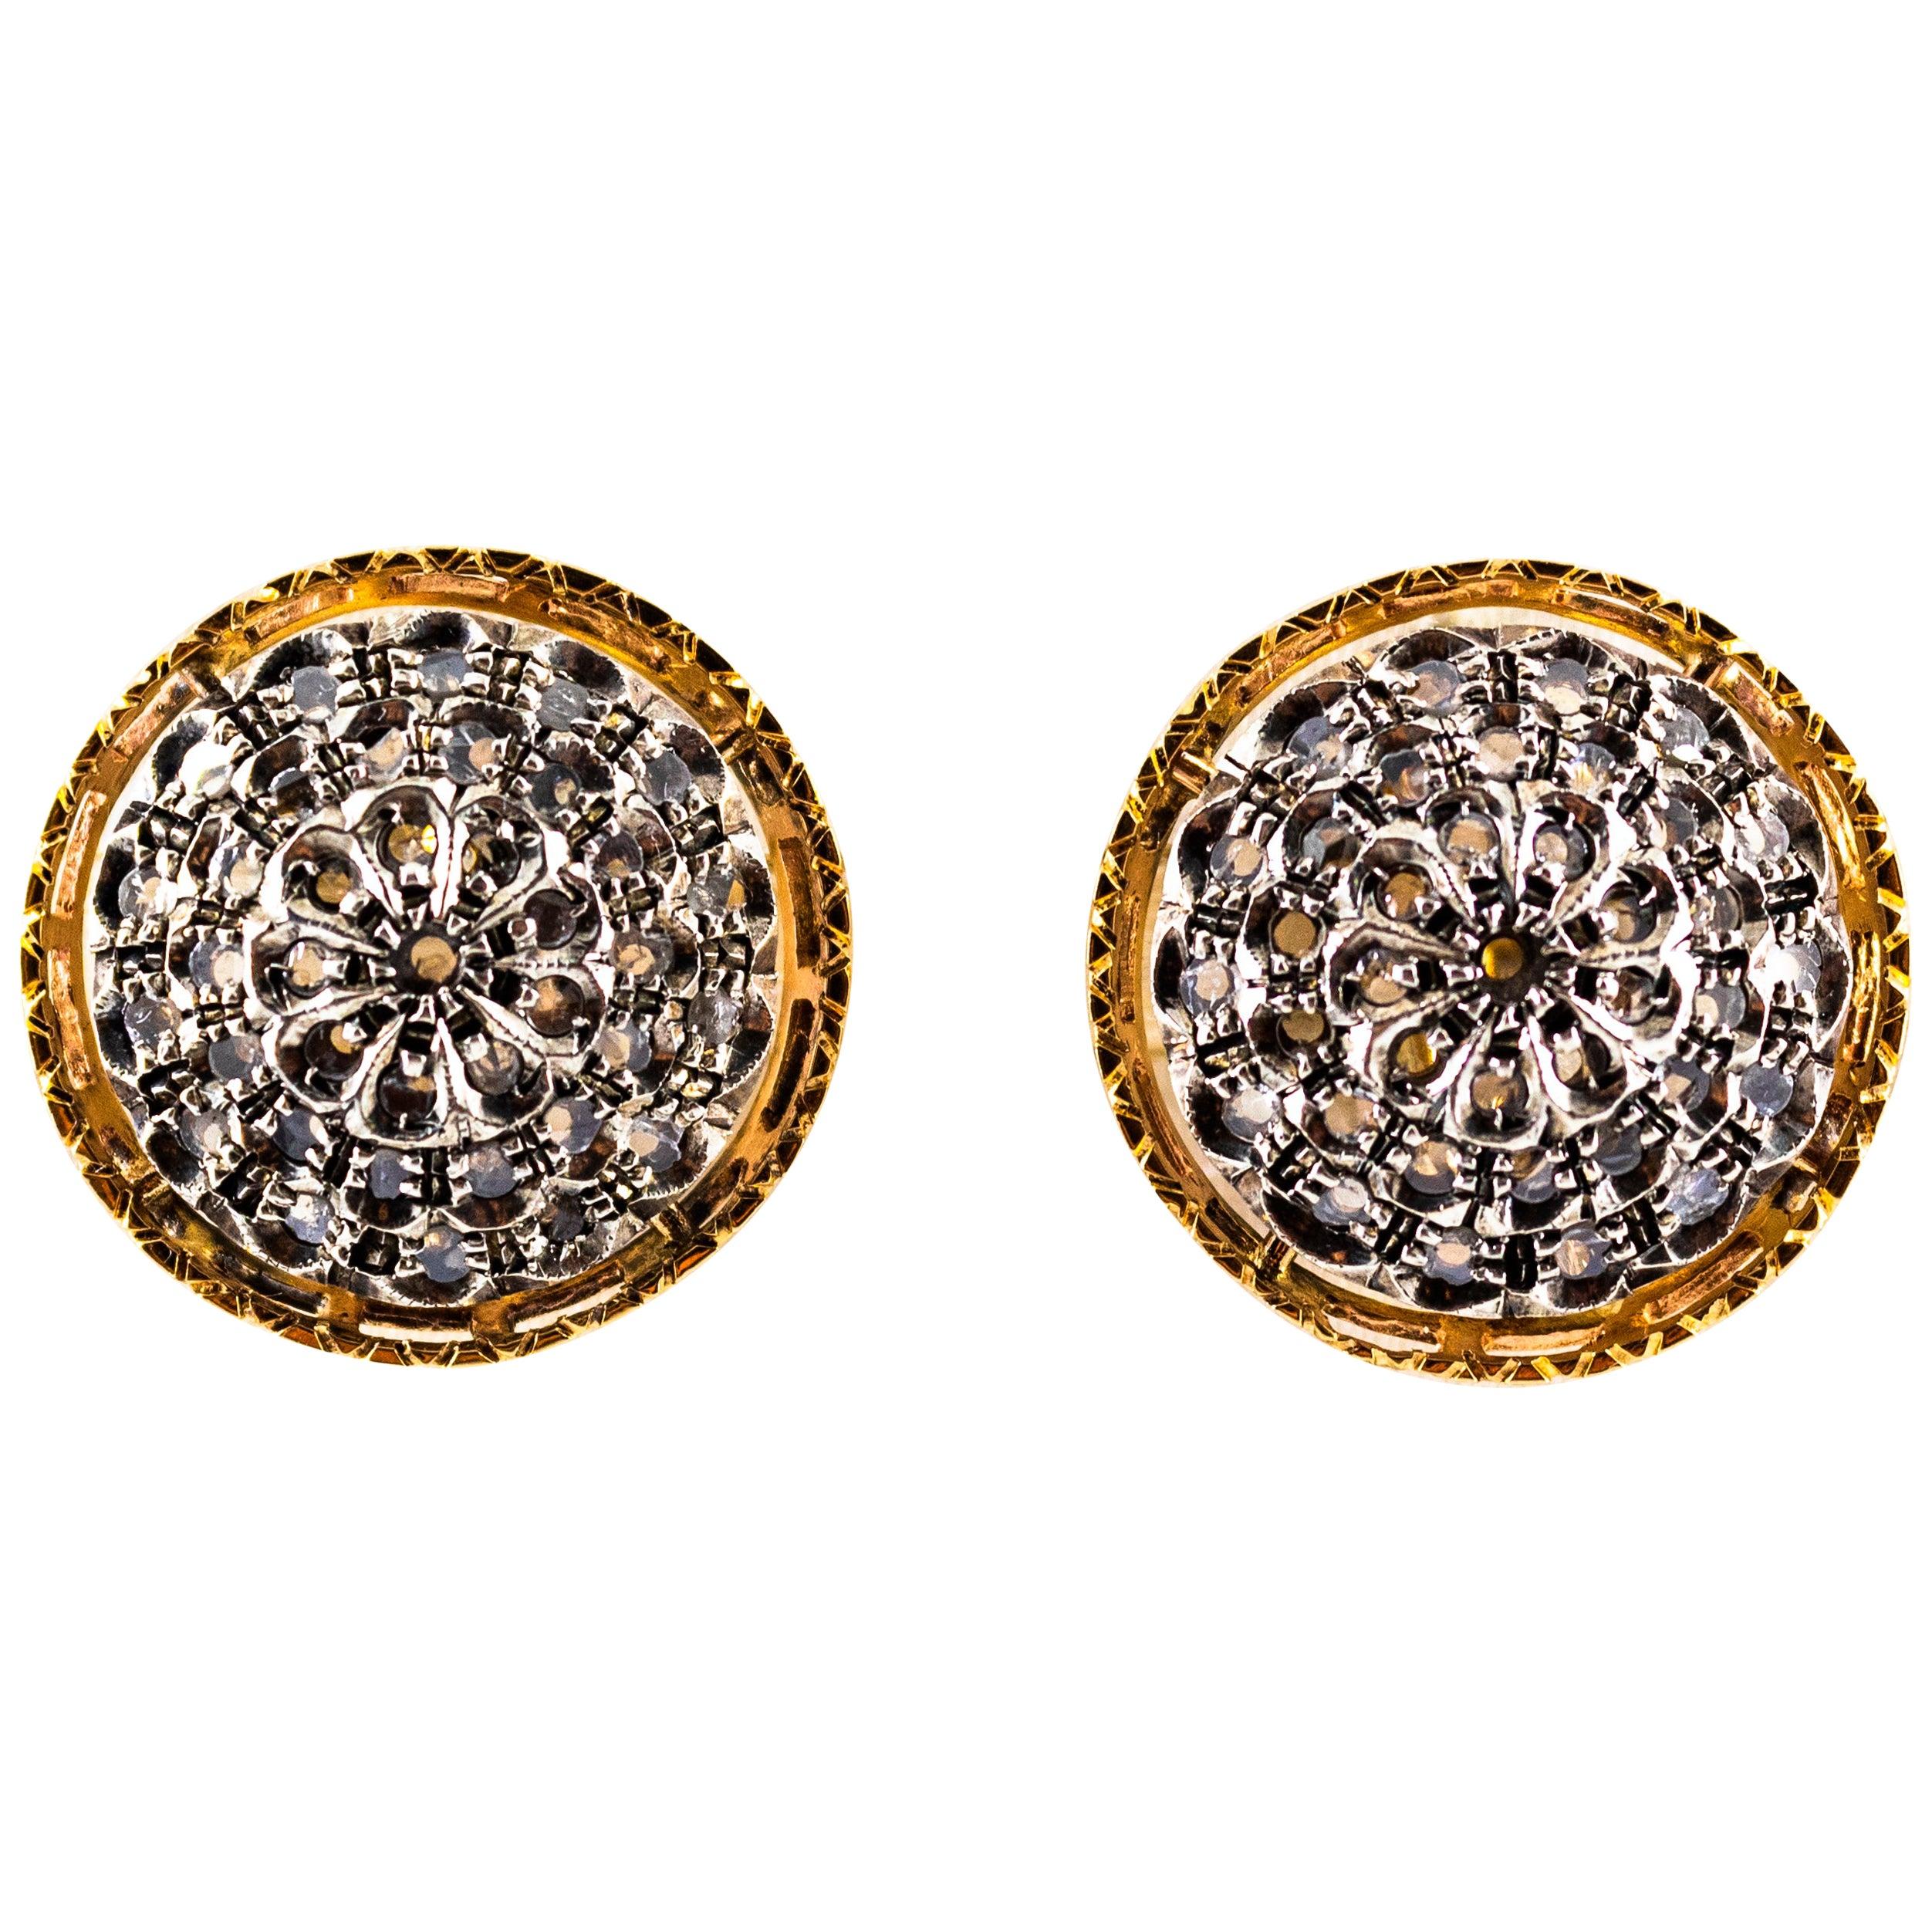 Art Deco Style 0.85 Carat White Rose Cut Diamond Yellow Gold Clip-On Earrings